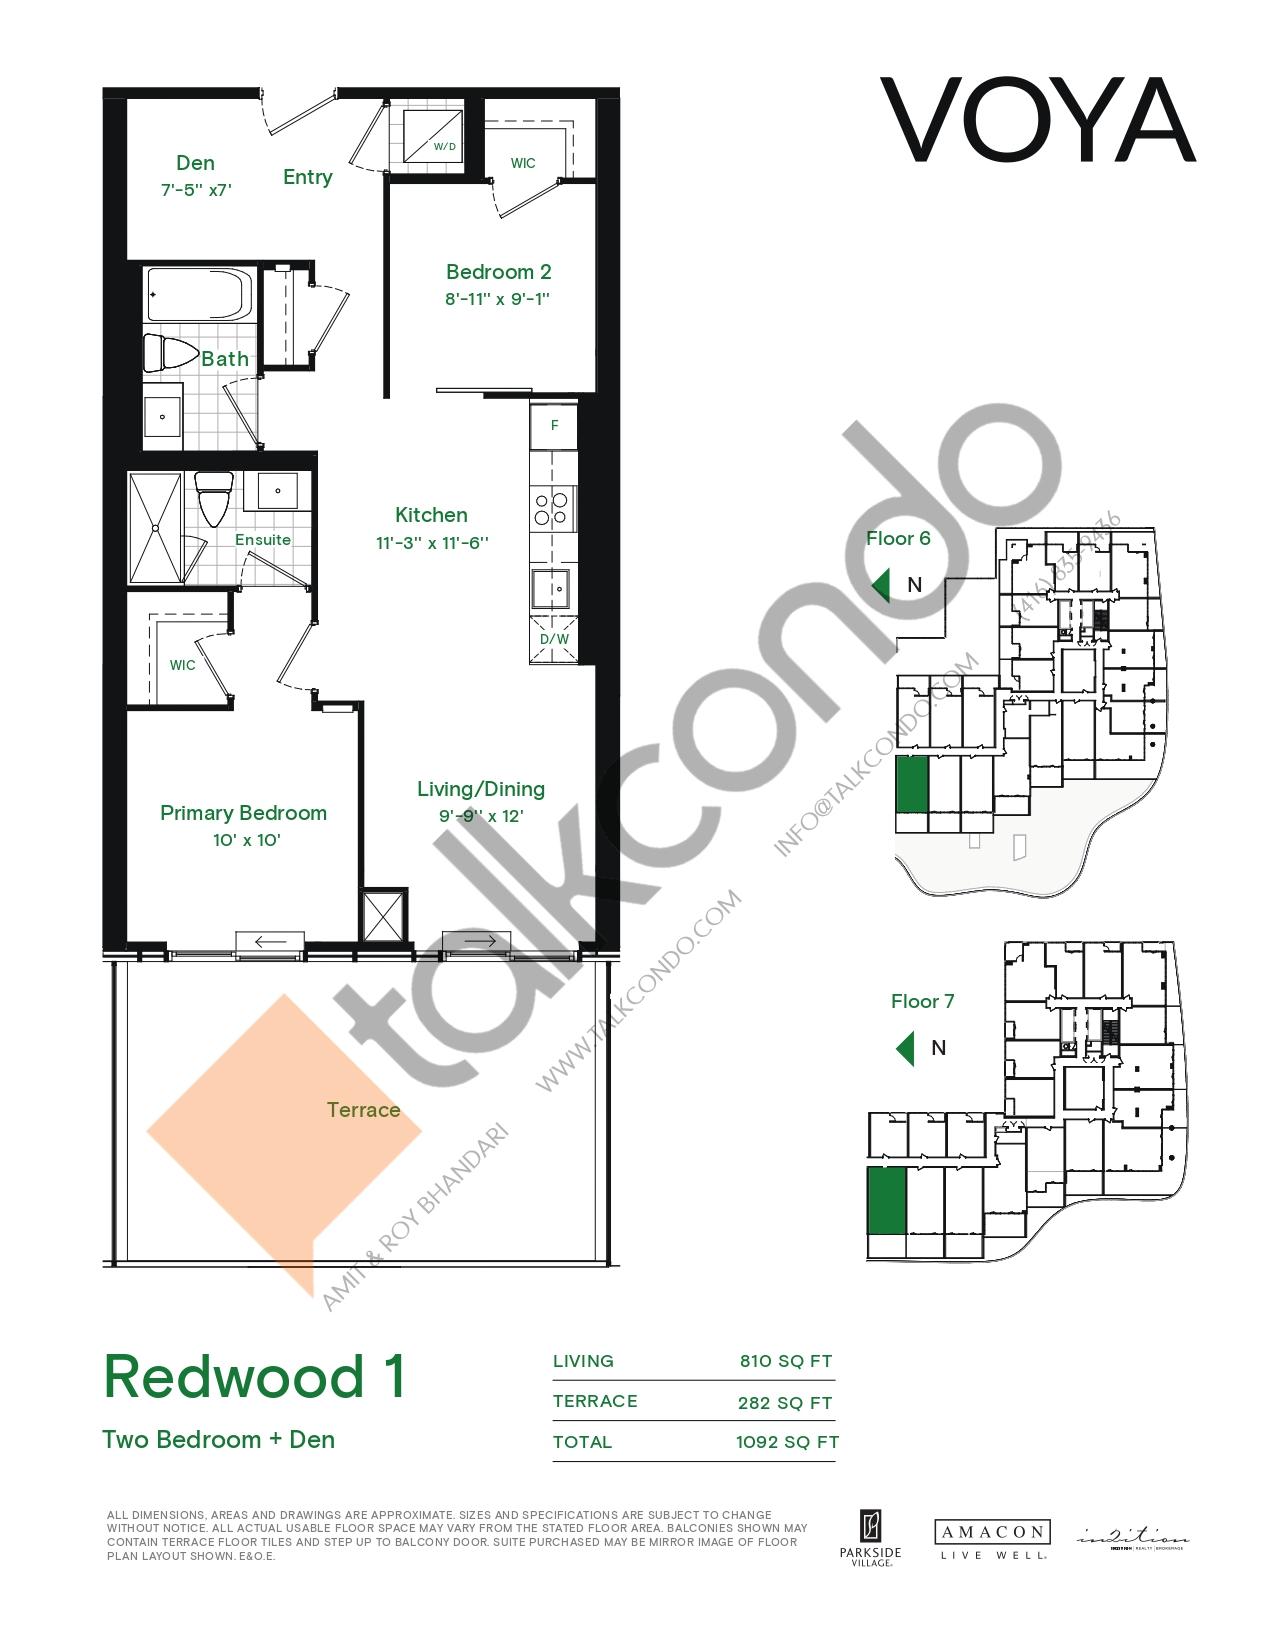 Redwood 1 (Podium) Floor Plan at Voya at Parkside Village Condos - 810 sq.ft